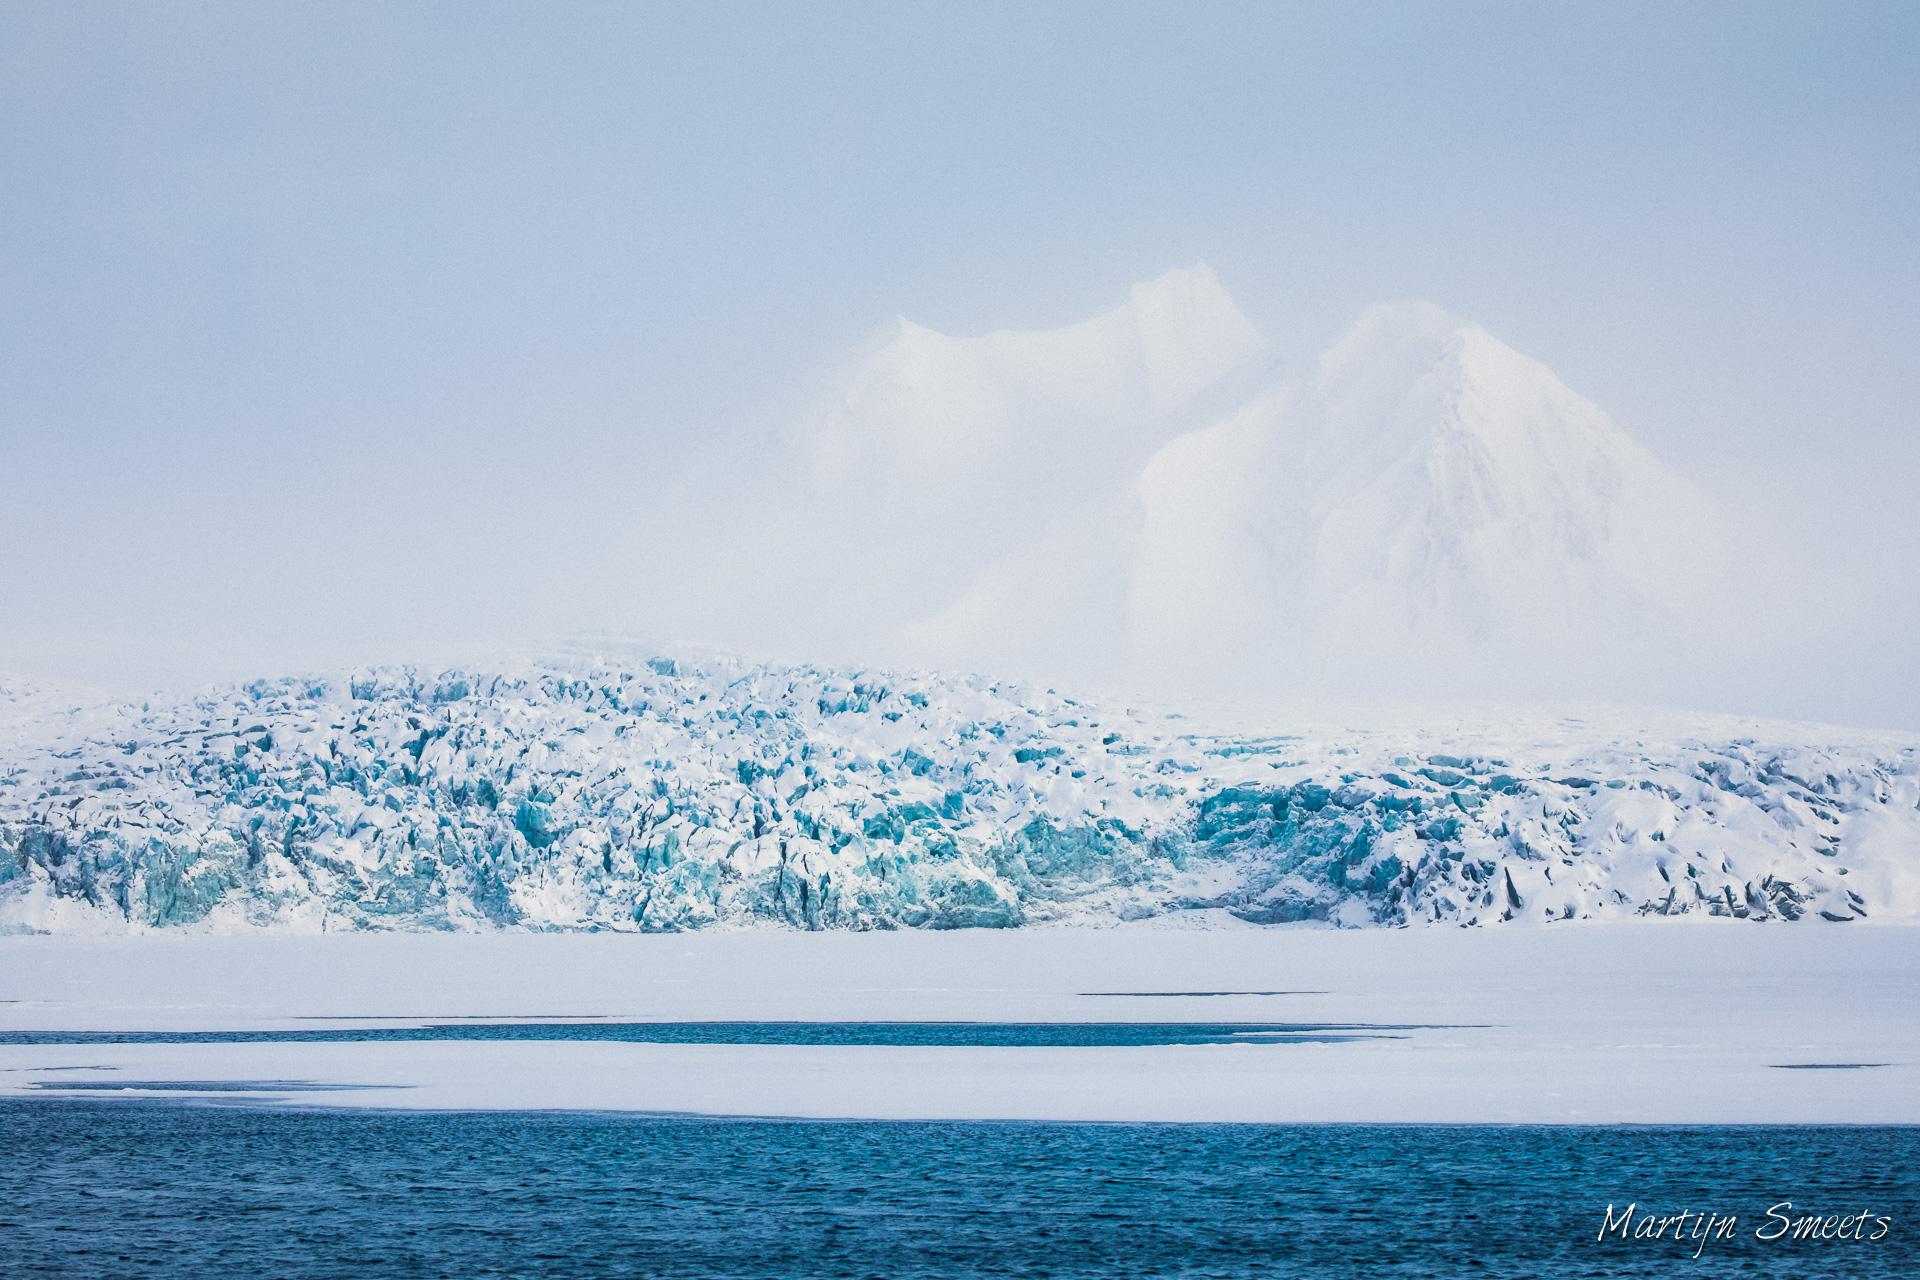 Ochtendnevel boven de Esmarkbreen in Ymerbukta, Spitsbergen